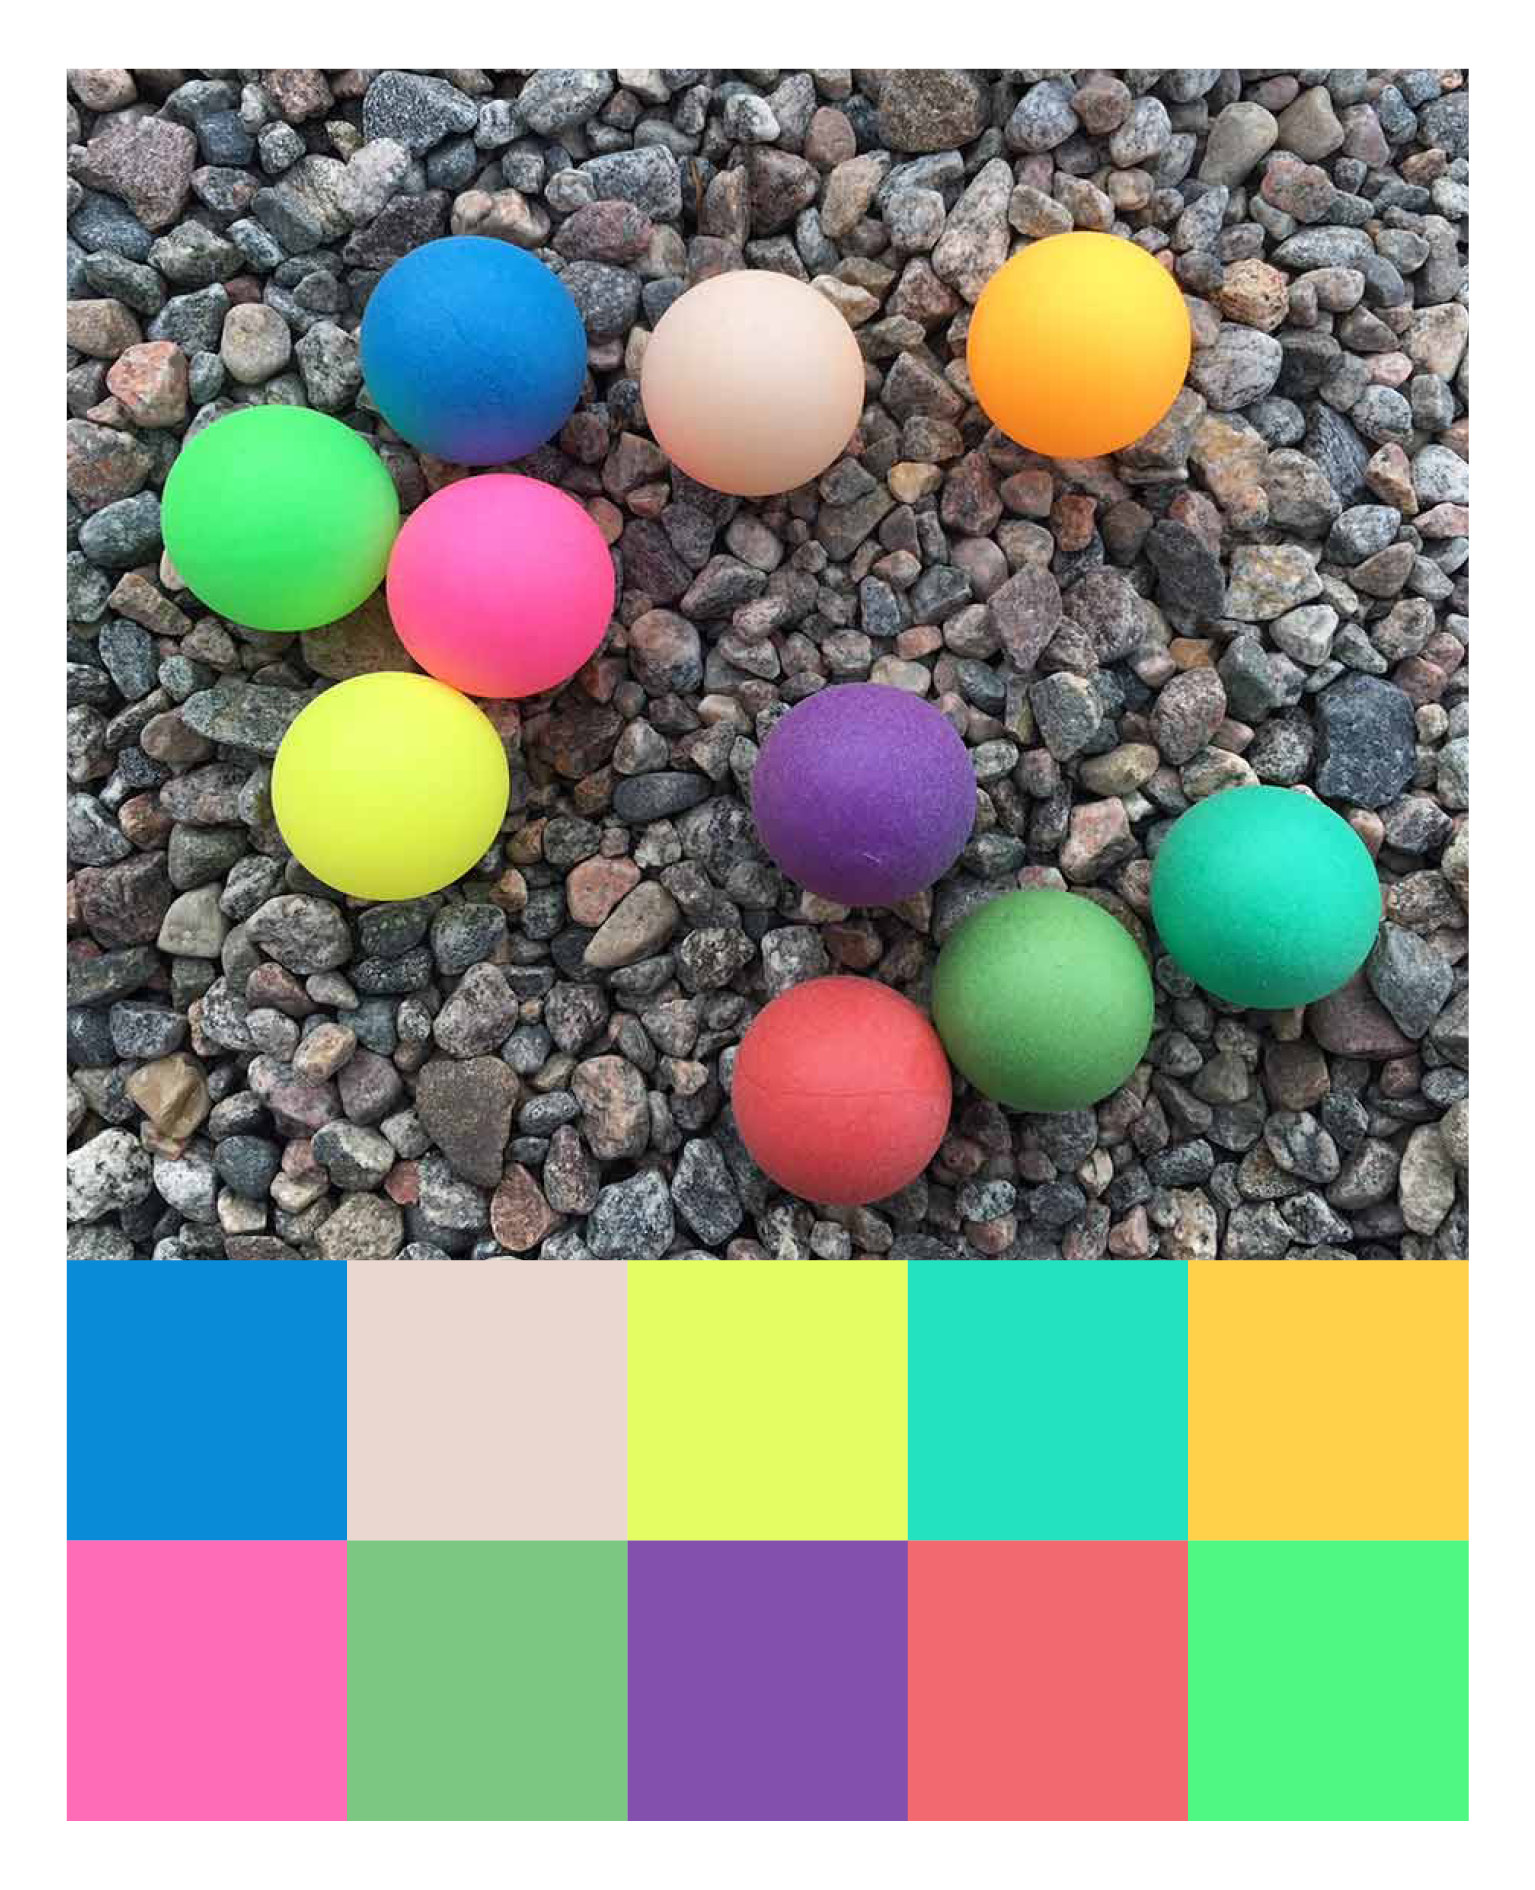 Färgschema 1